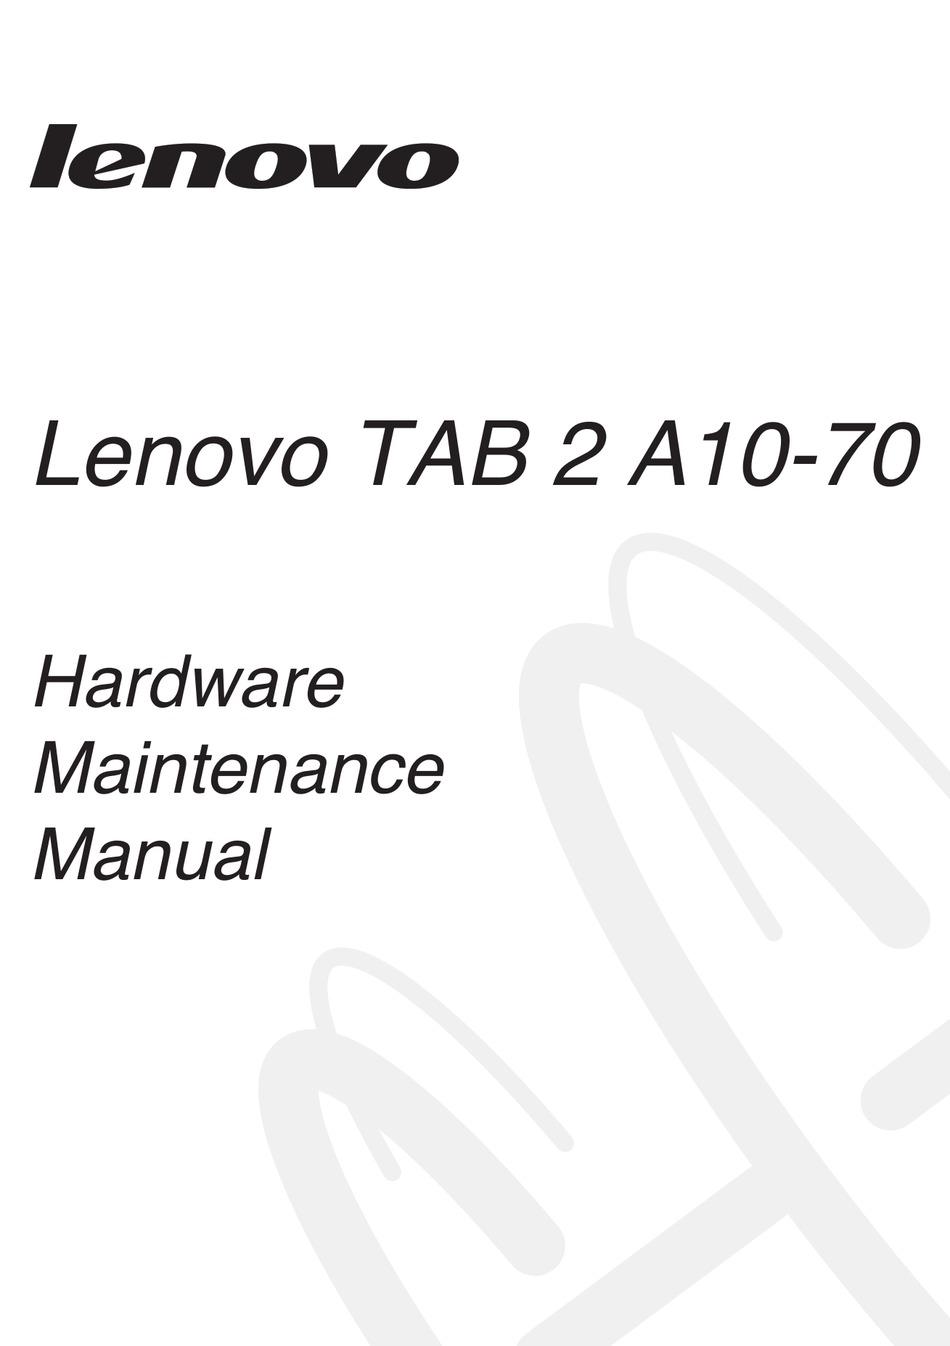 LENOVO TAB 2 A10-70 HARDWARE MAINTENANCE MANUAL Pdf